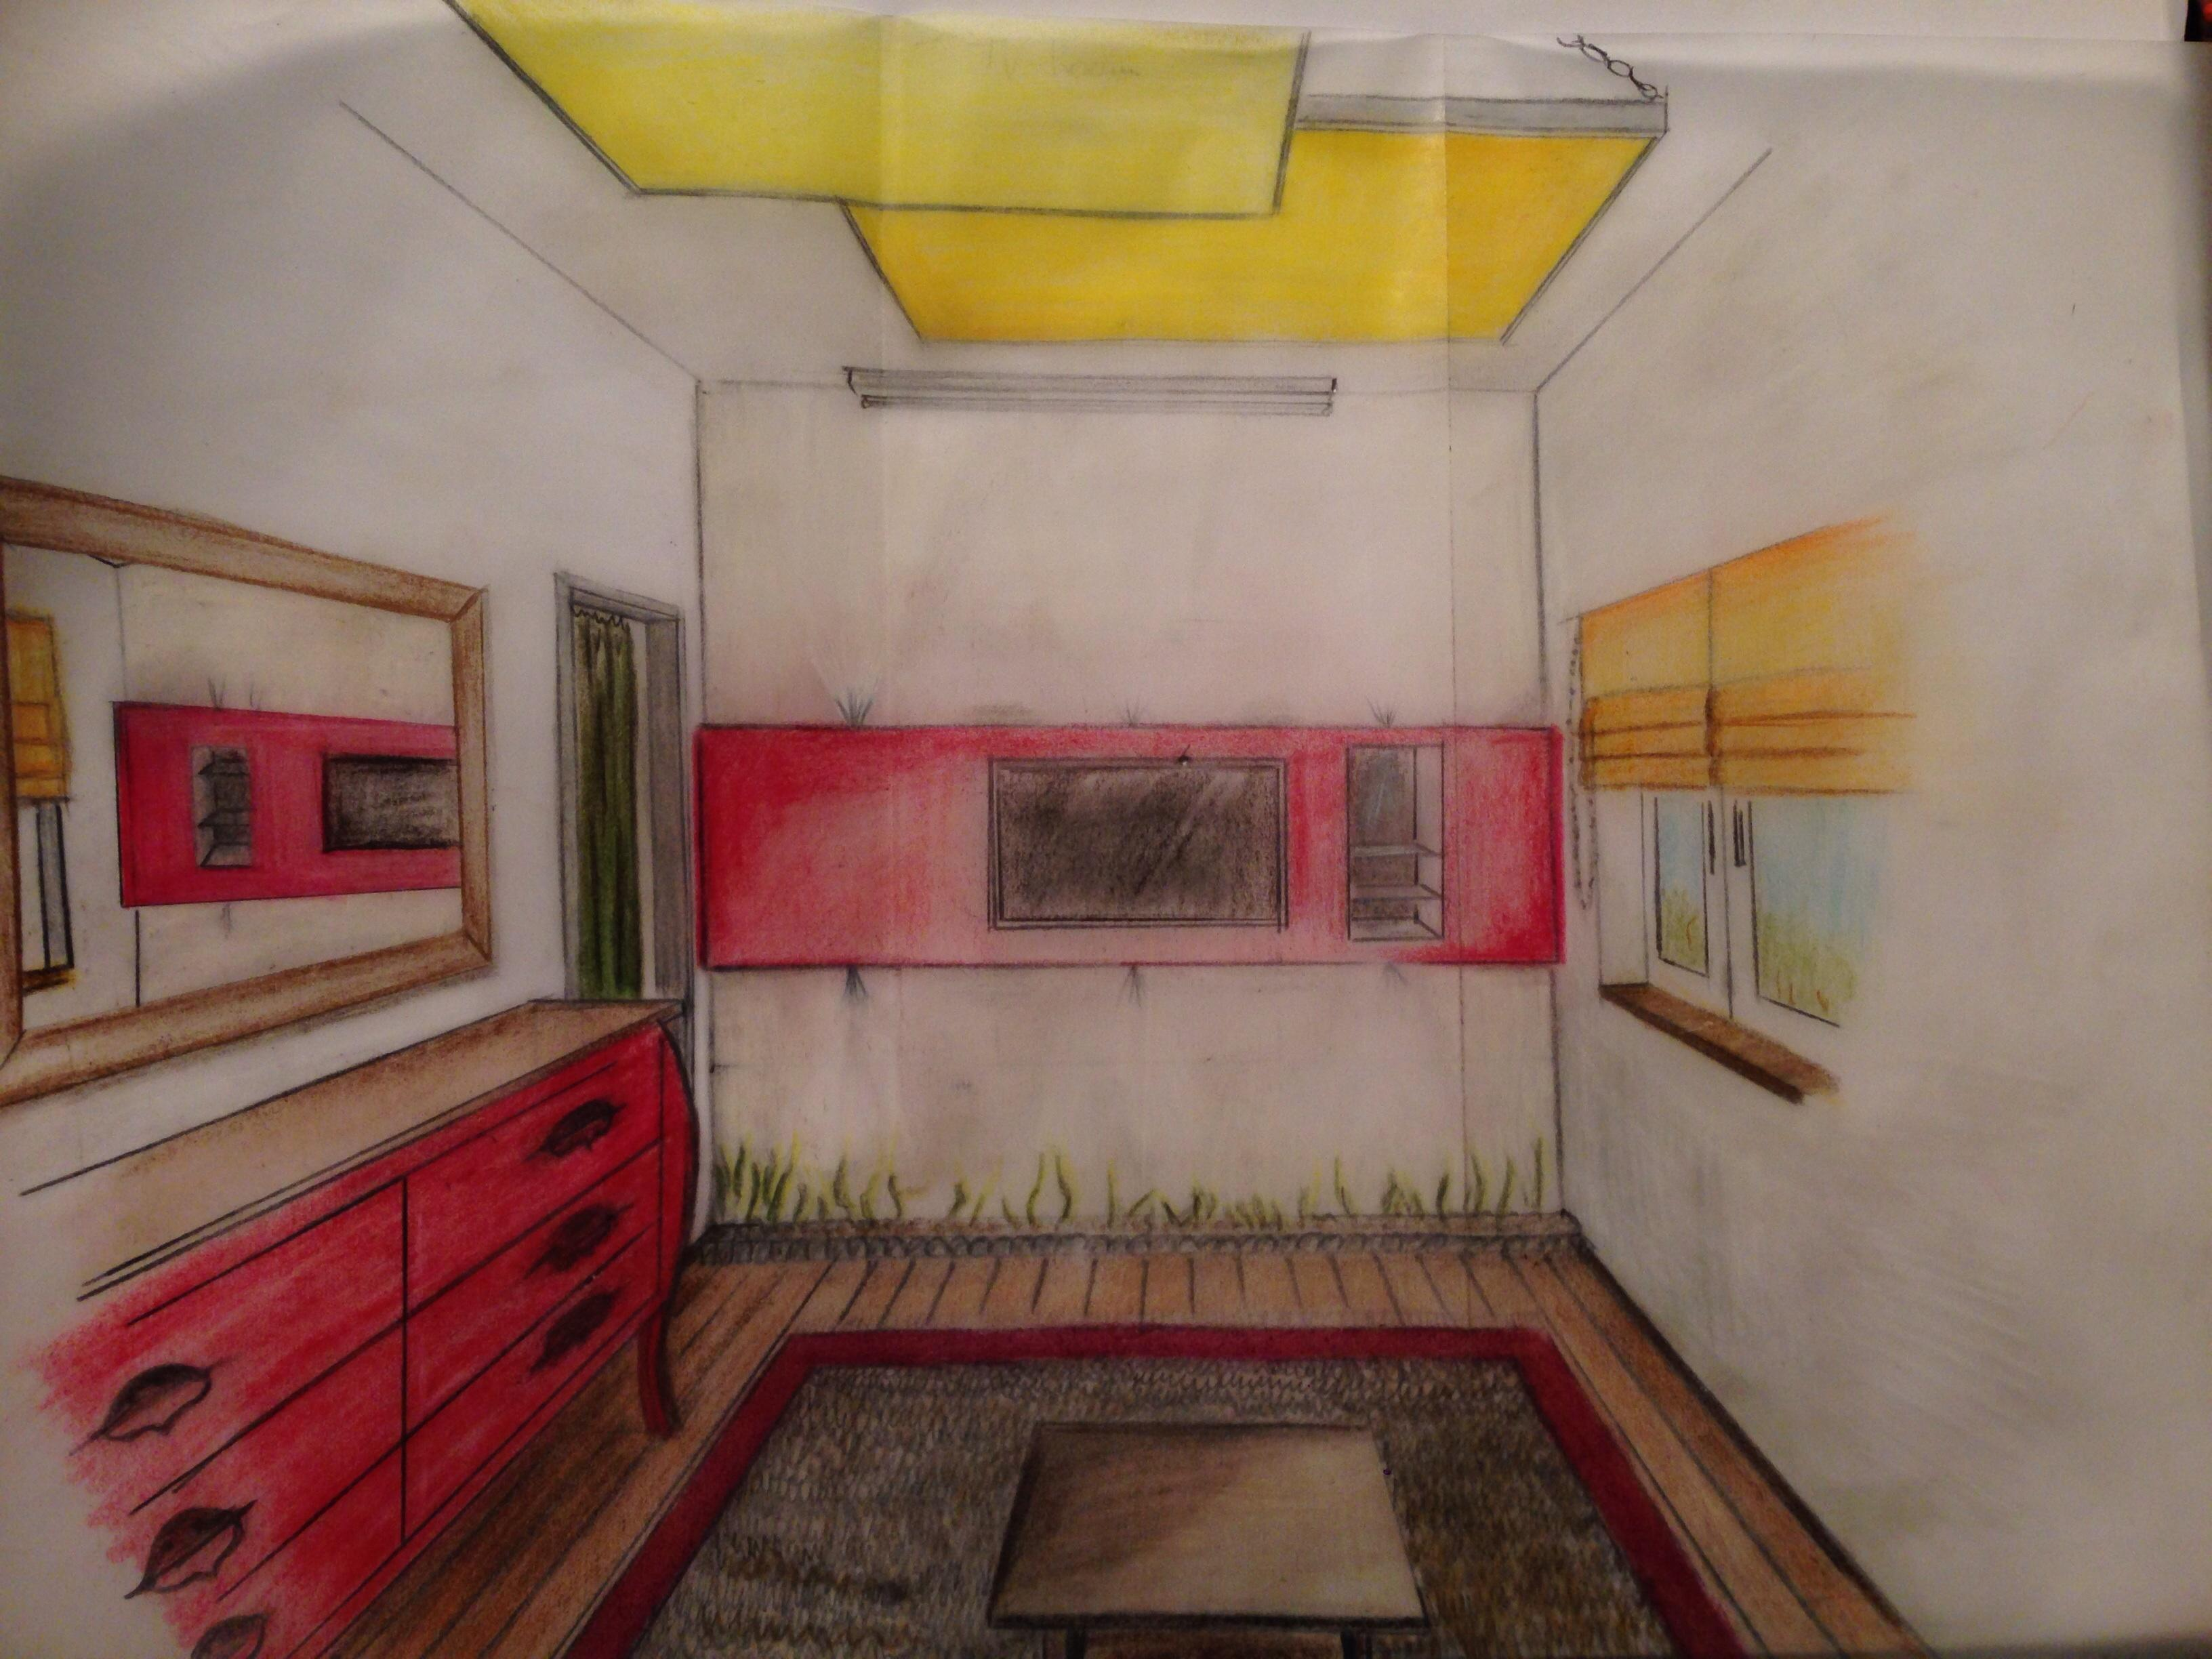 raum selber gestalten flottebo sofaideen fr mehr raum zum leben d zum gemaumllde mit. Black Bedroom Furniture Sets. Home Design Ideas